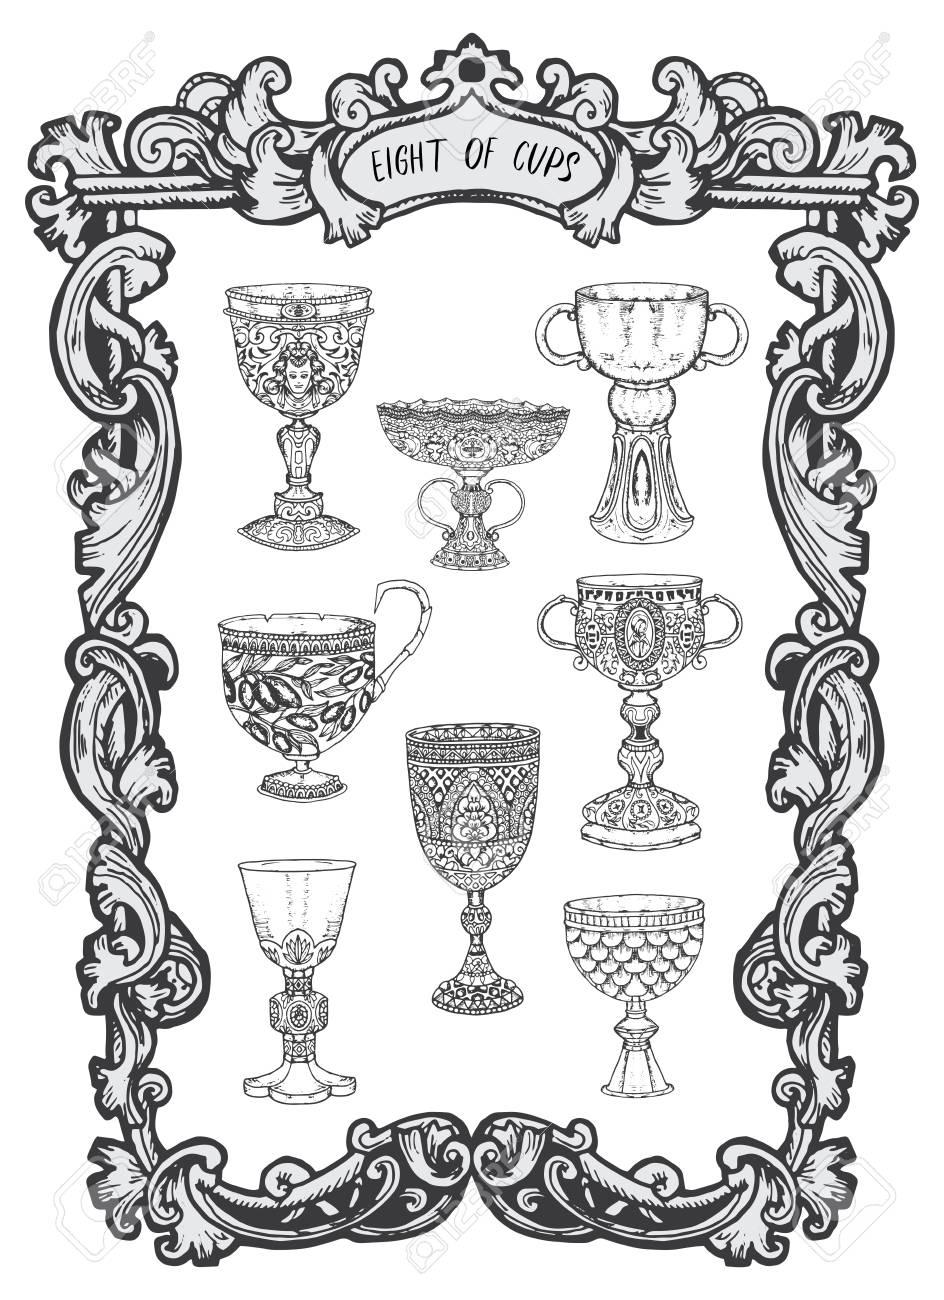 Eight Of Cups Minor Arcana Tarot Card The Magic Gate Deckfantasy